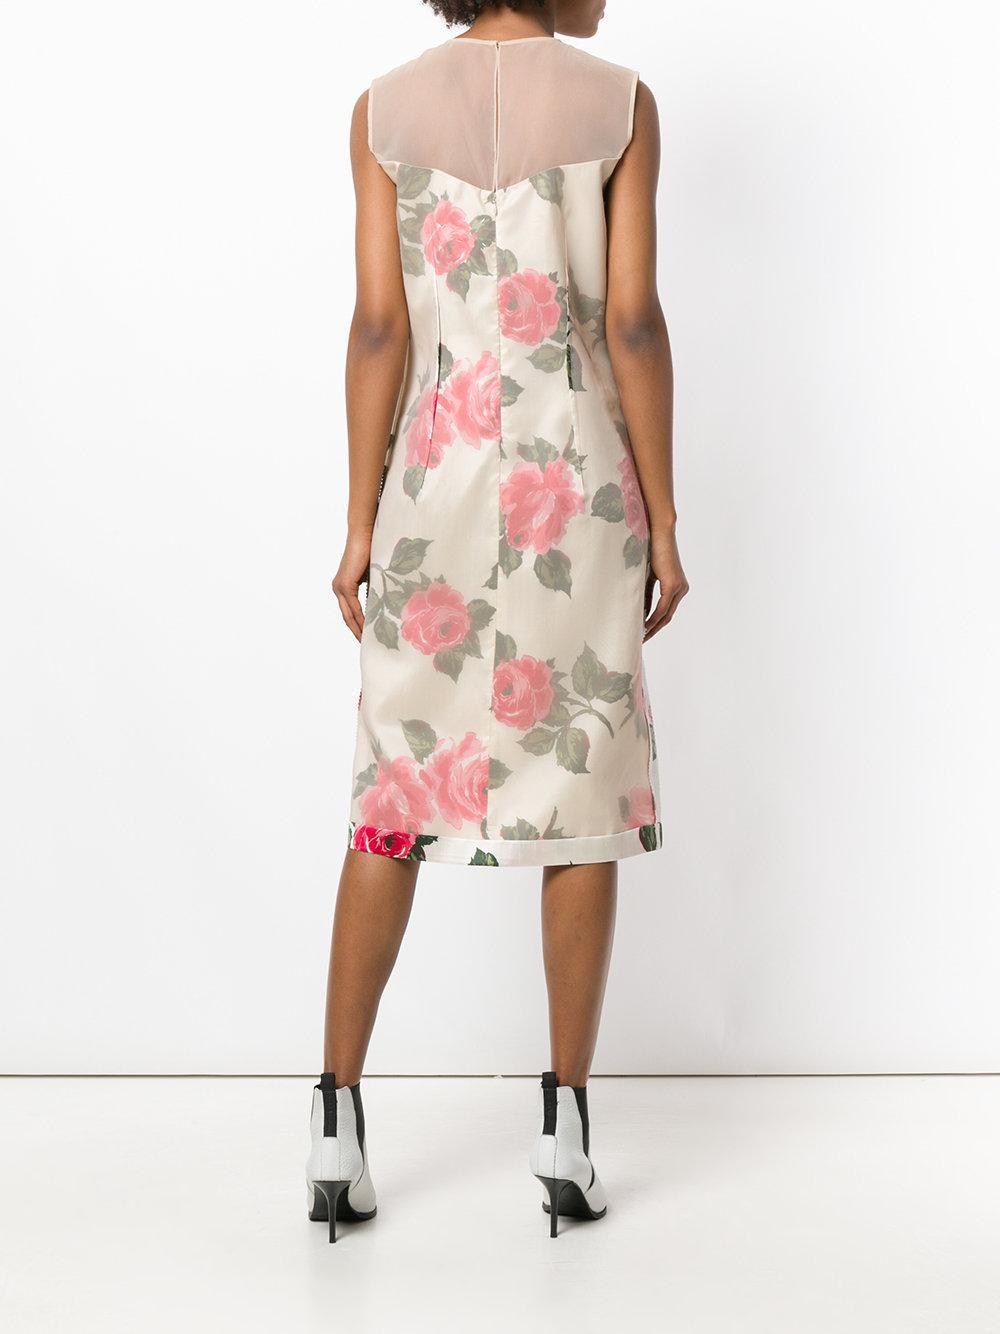 floral print dress - Nude & Neutrals Maison Martin Margiela CwTskLj